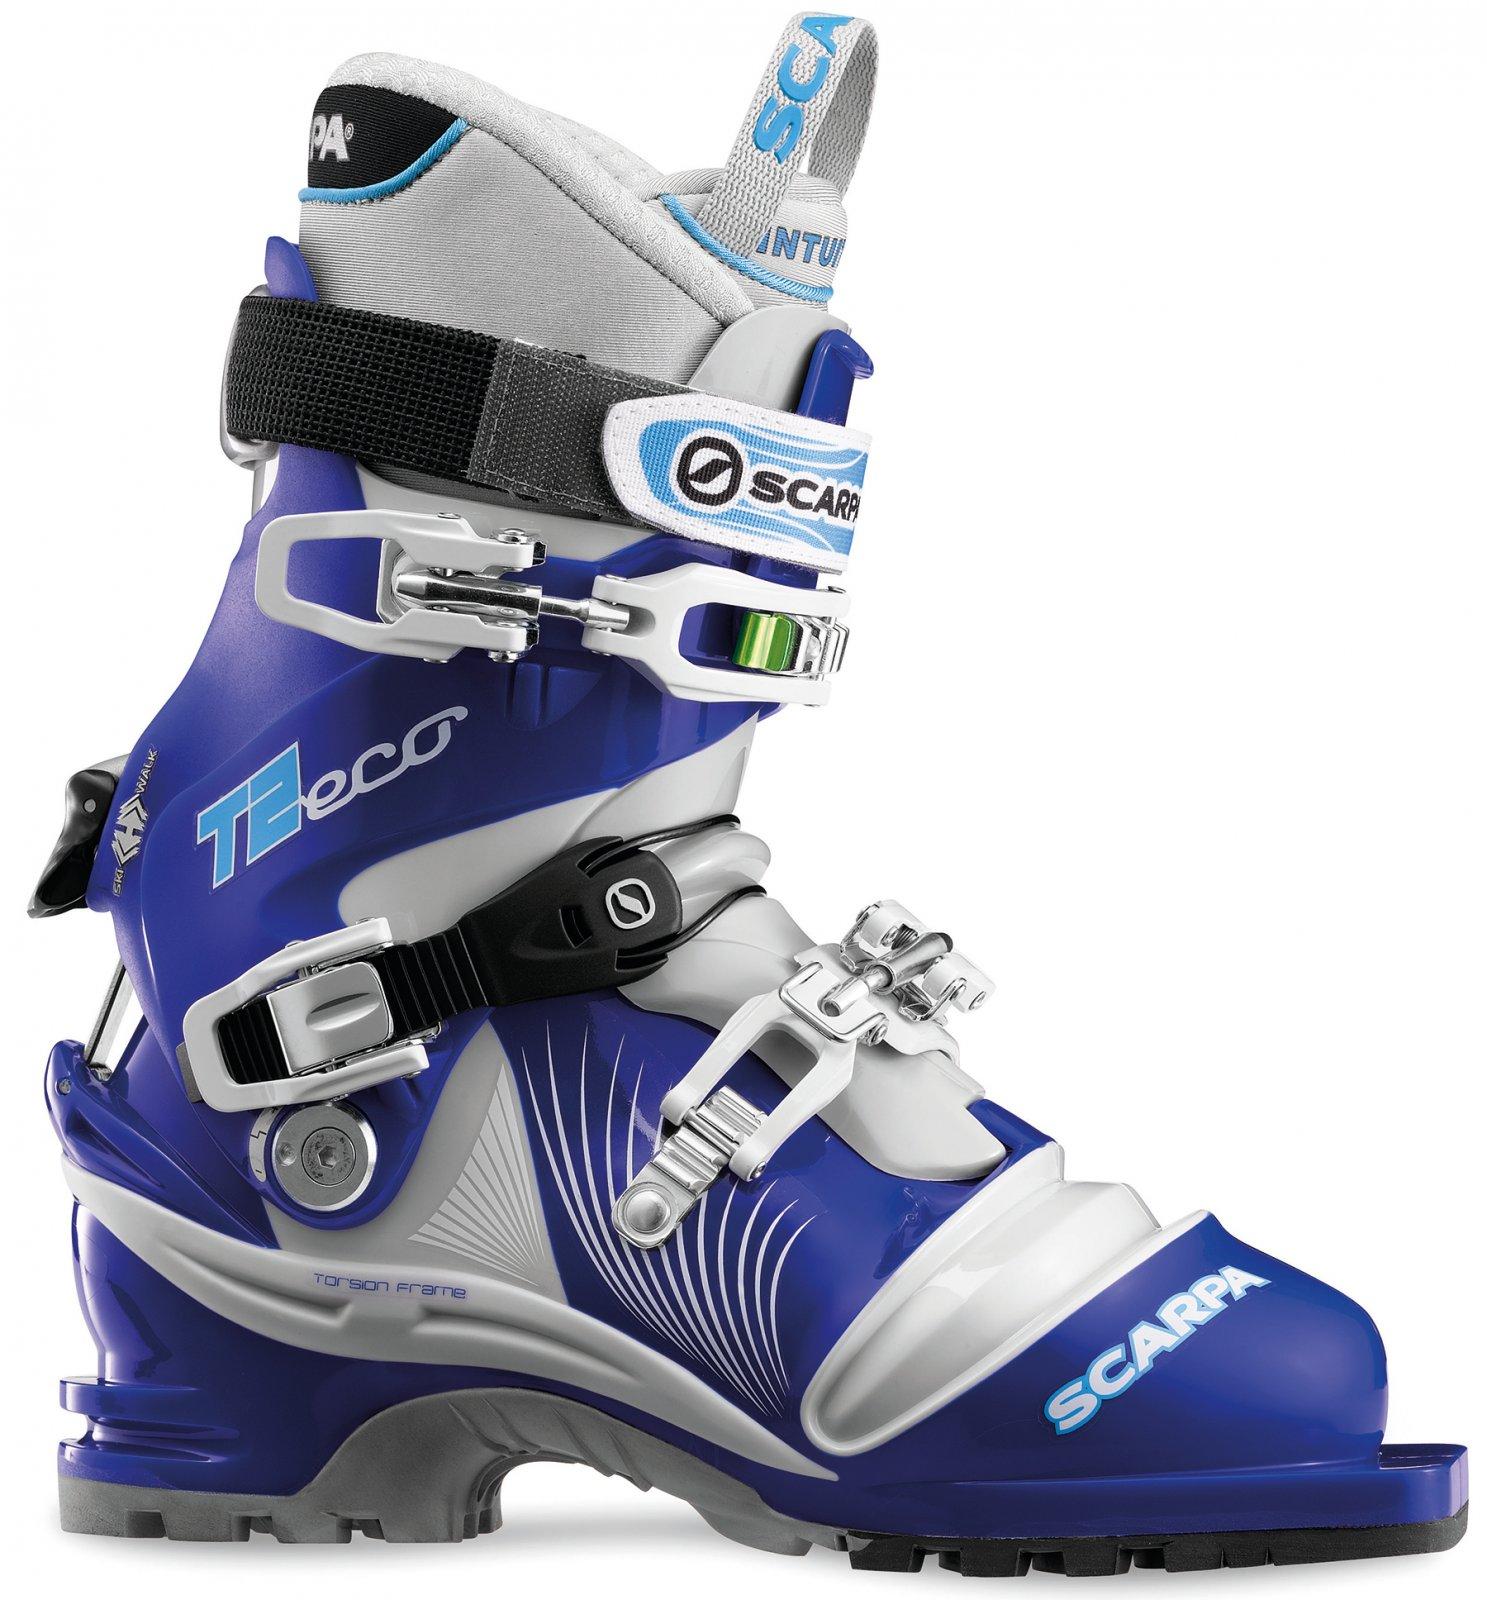 Scarpa T2 ECO Women's Telemark Ski Boot (2015-16)